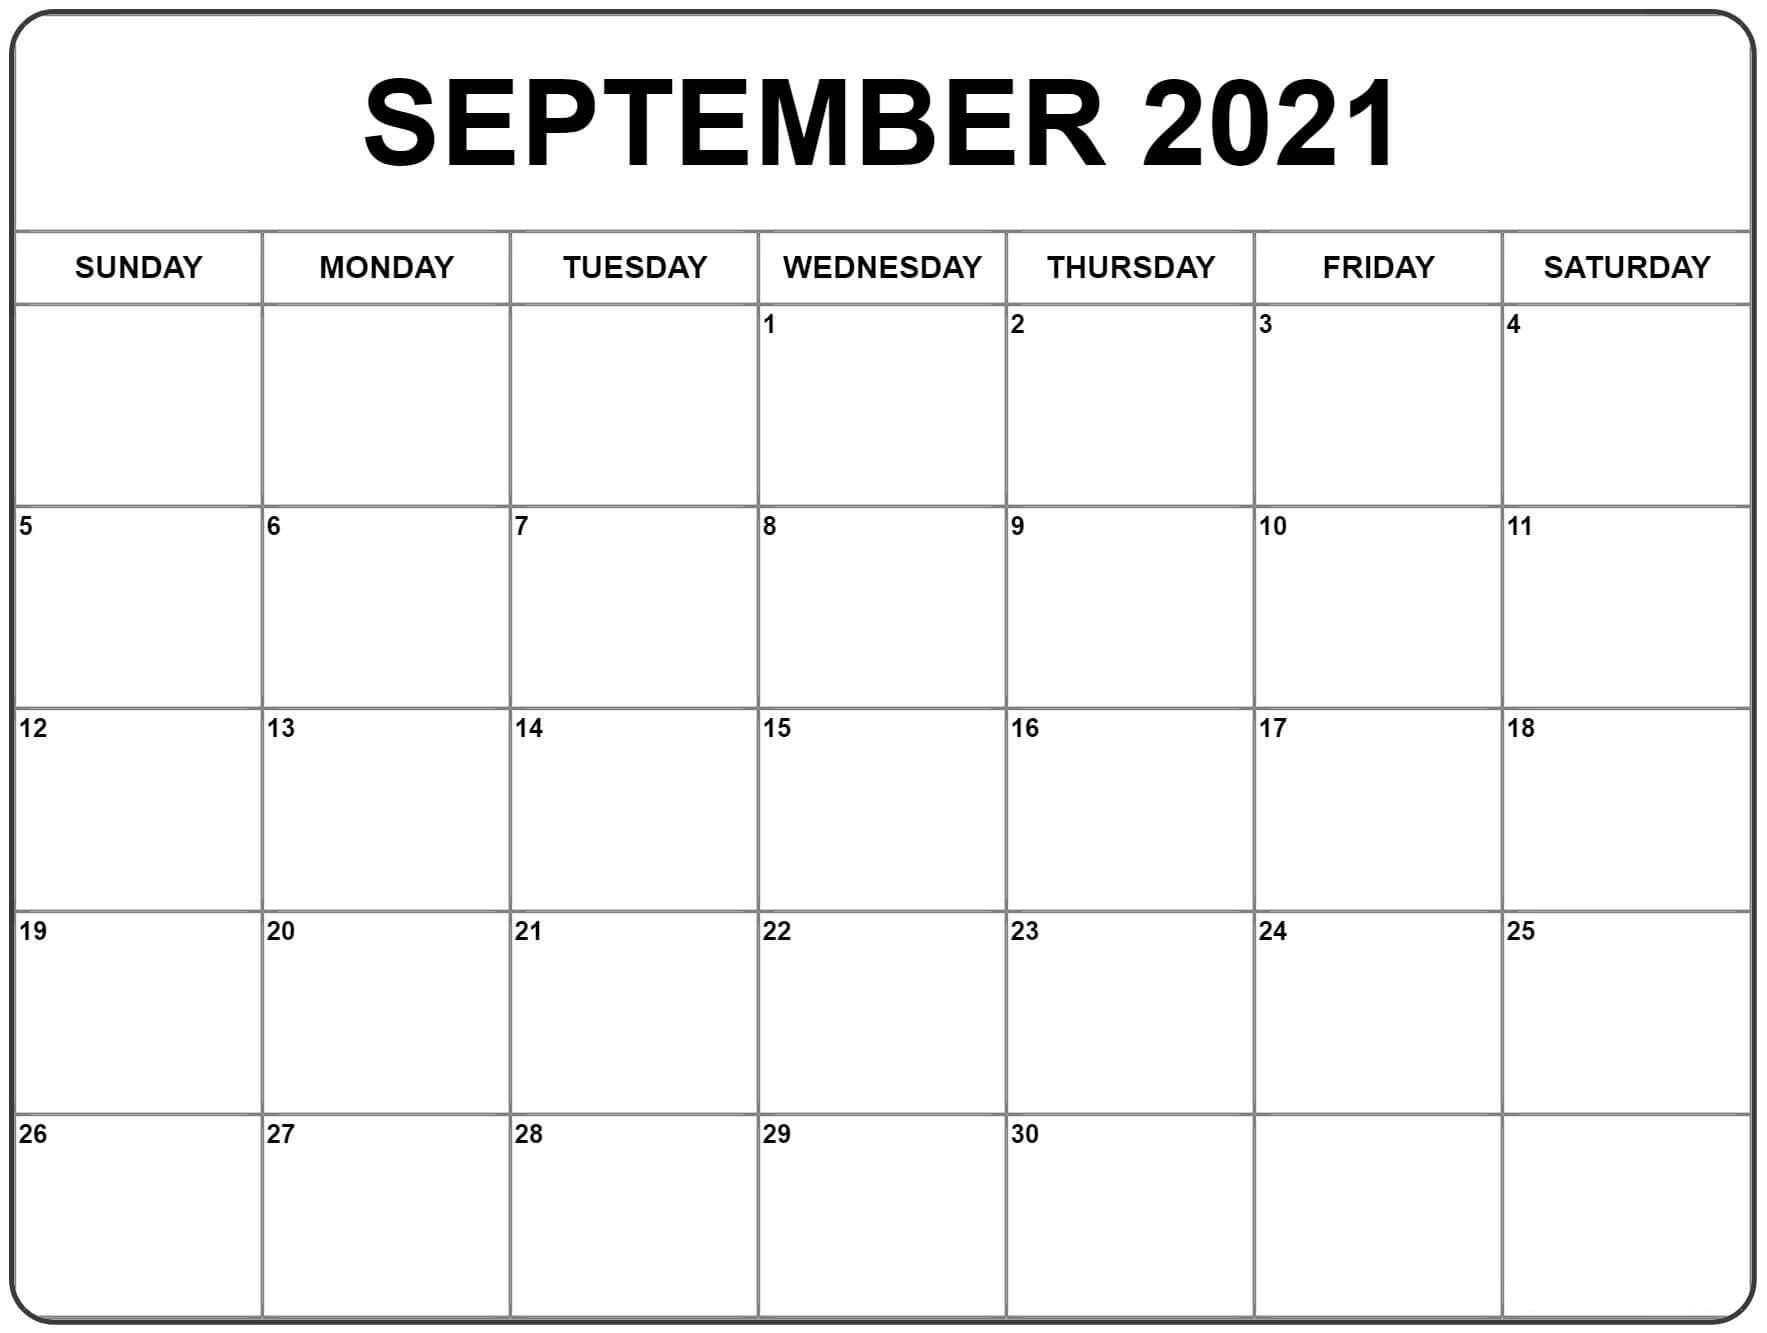 September 2021 Printable Calendar Template